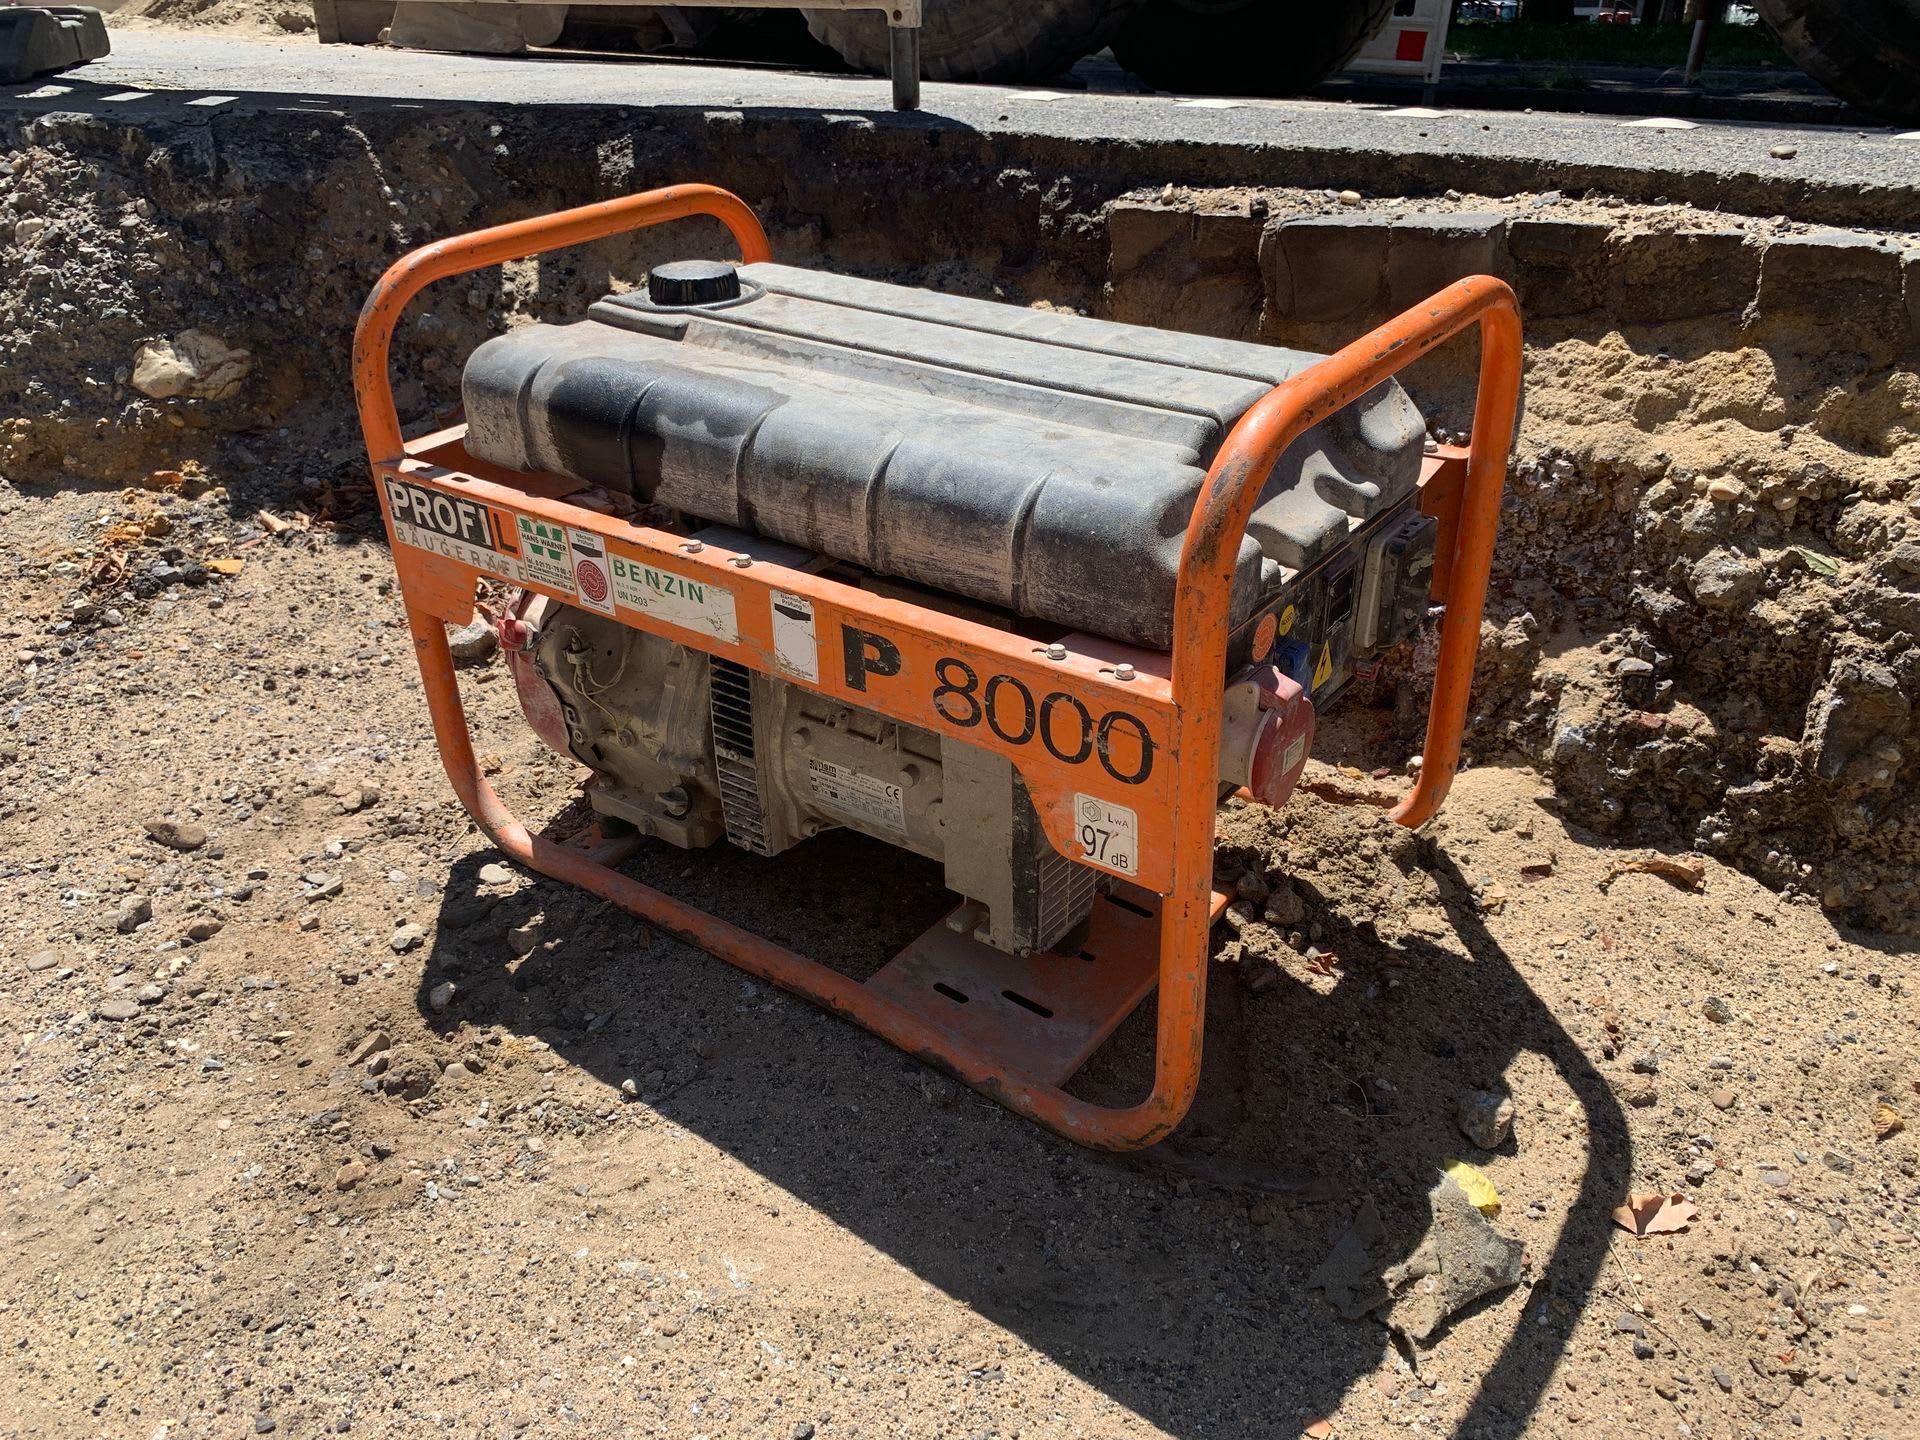 PROFIL P8000 Stromerzeuger